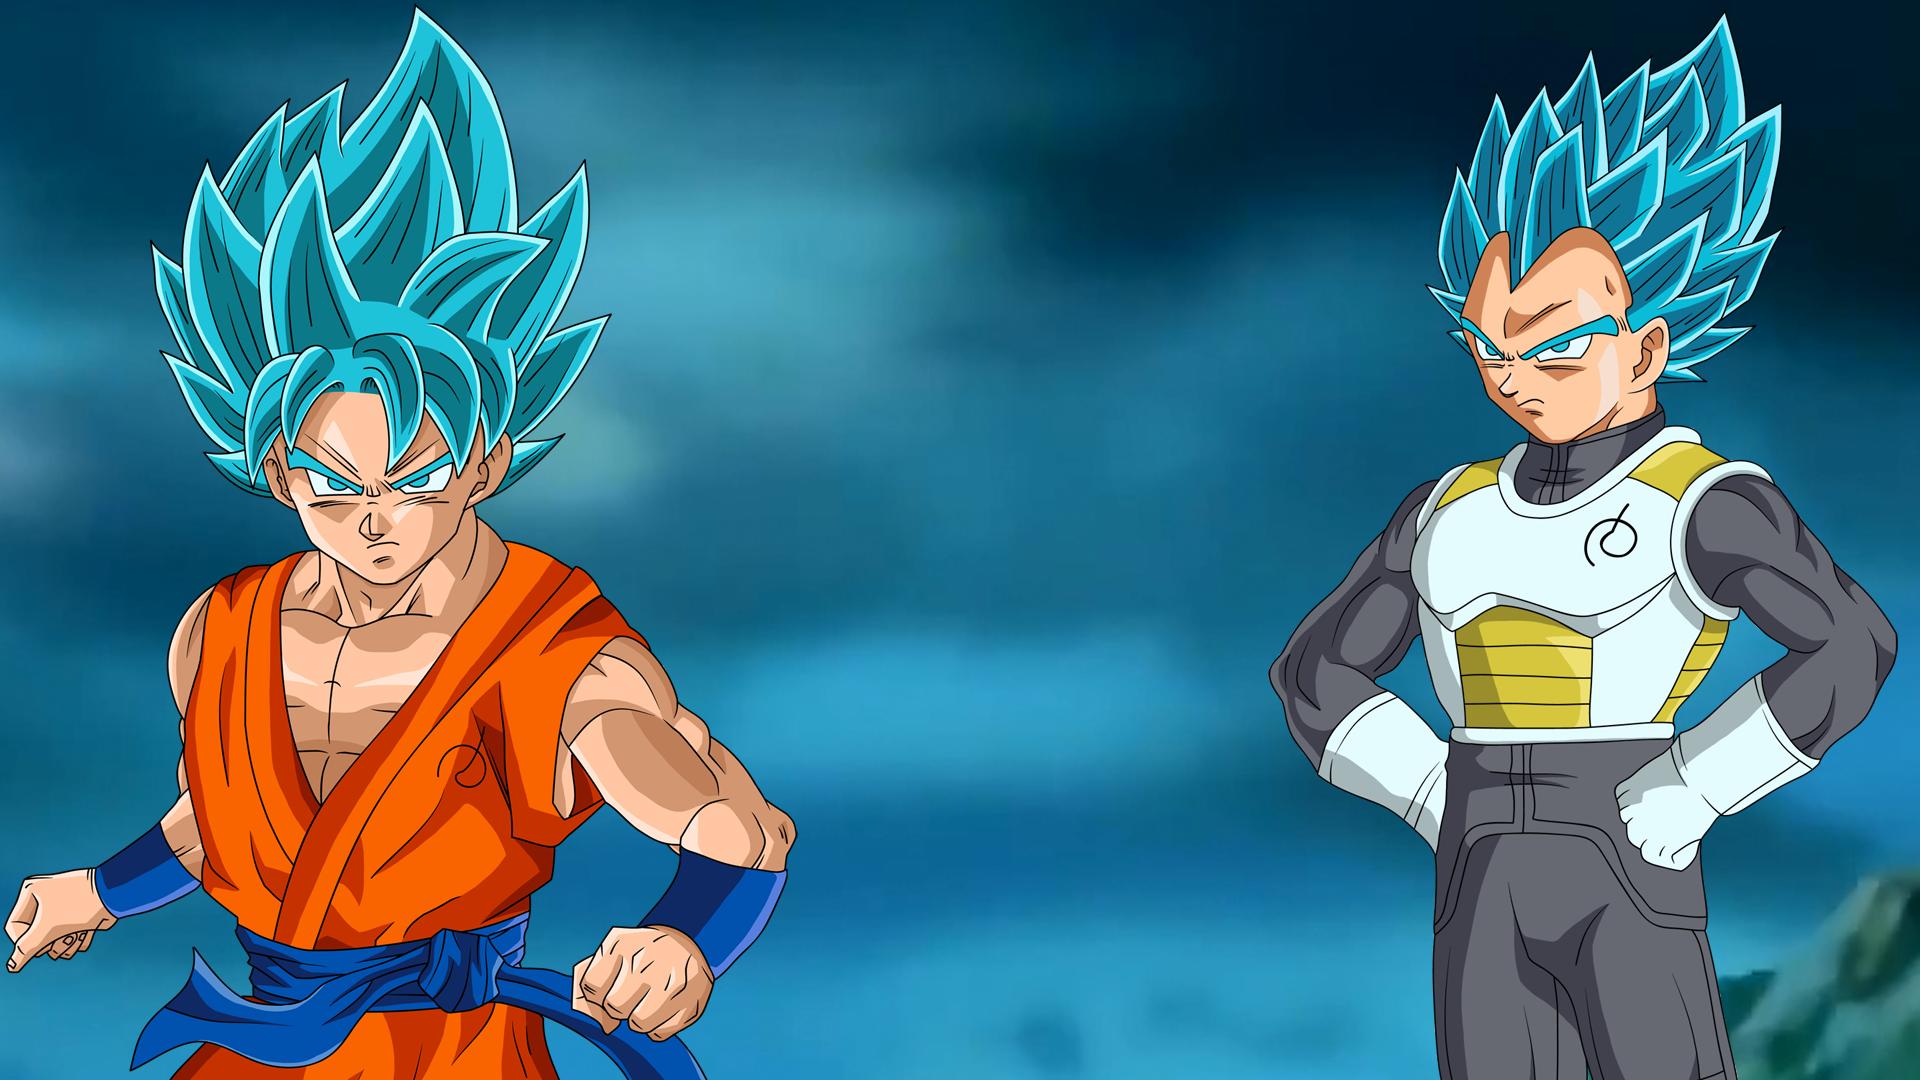 Goku And Vegeta Full Hd Fondo De Pantalla And Fondo De: SSGSS Goku & Vegeta Fondo De Pantalla HD